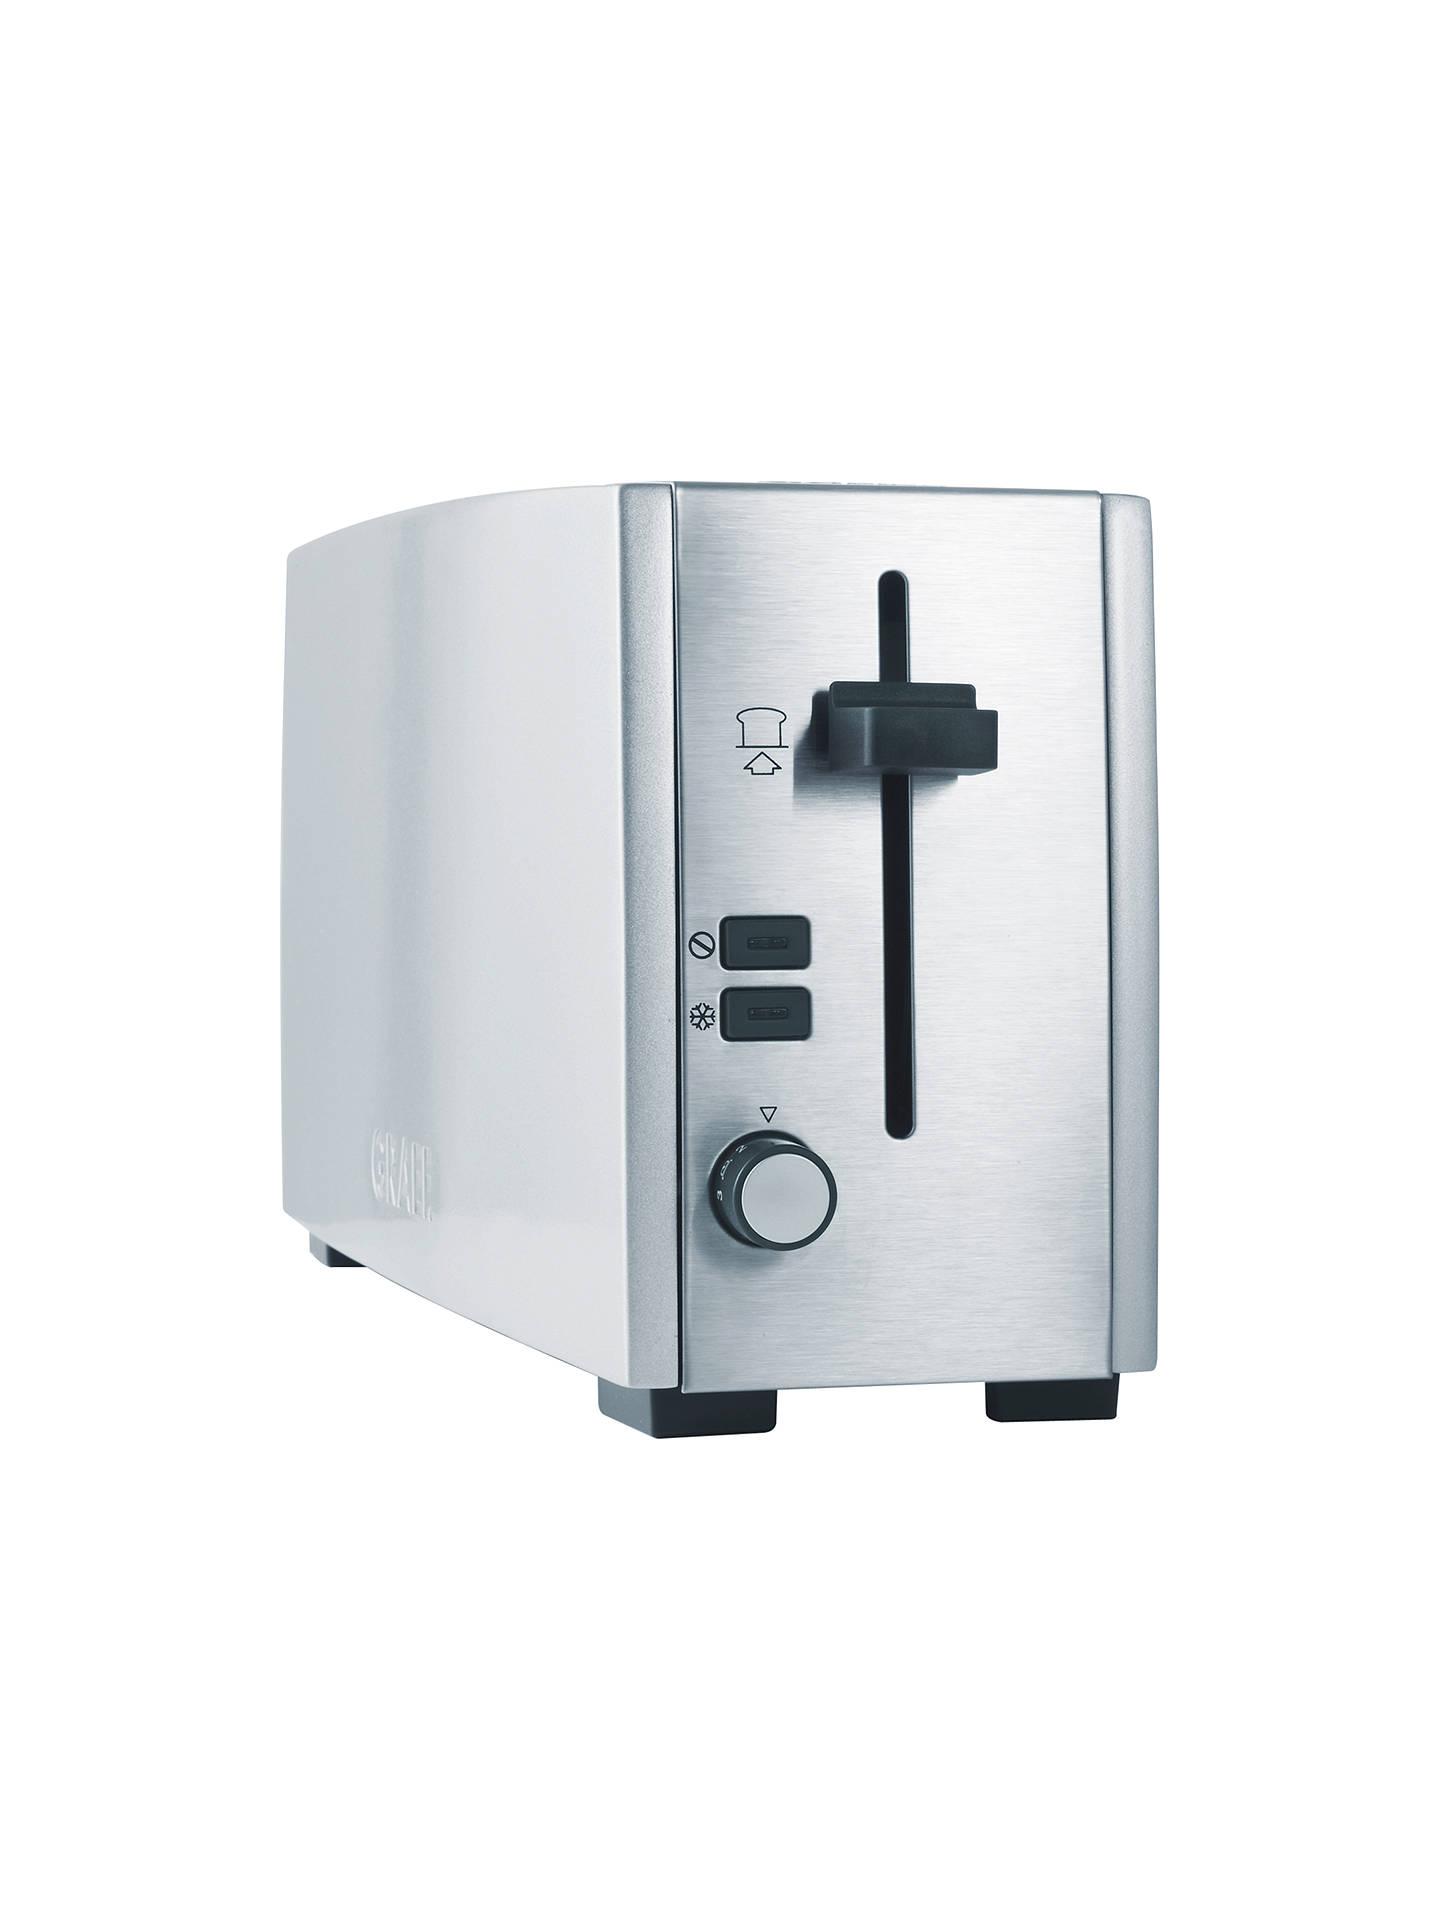 Graef long slot 2-slice toaster brushed silver free online slots play money